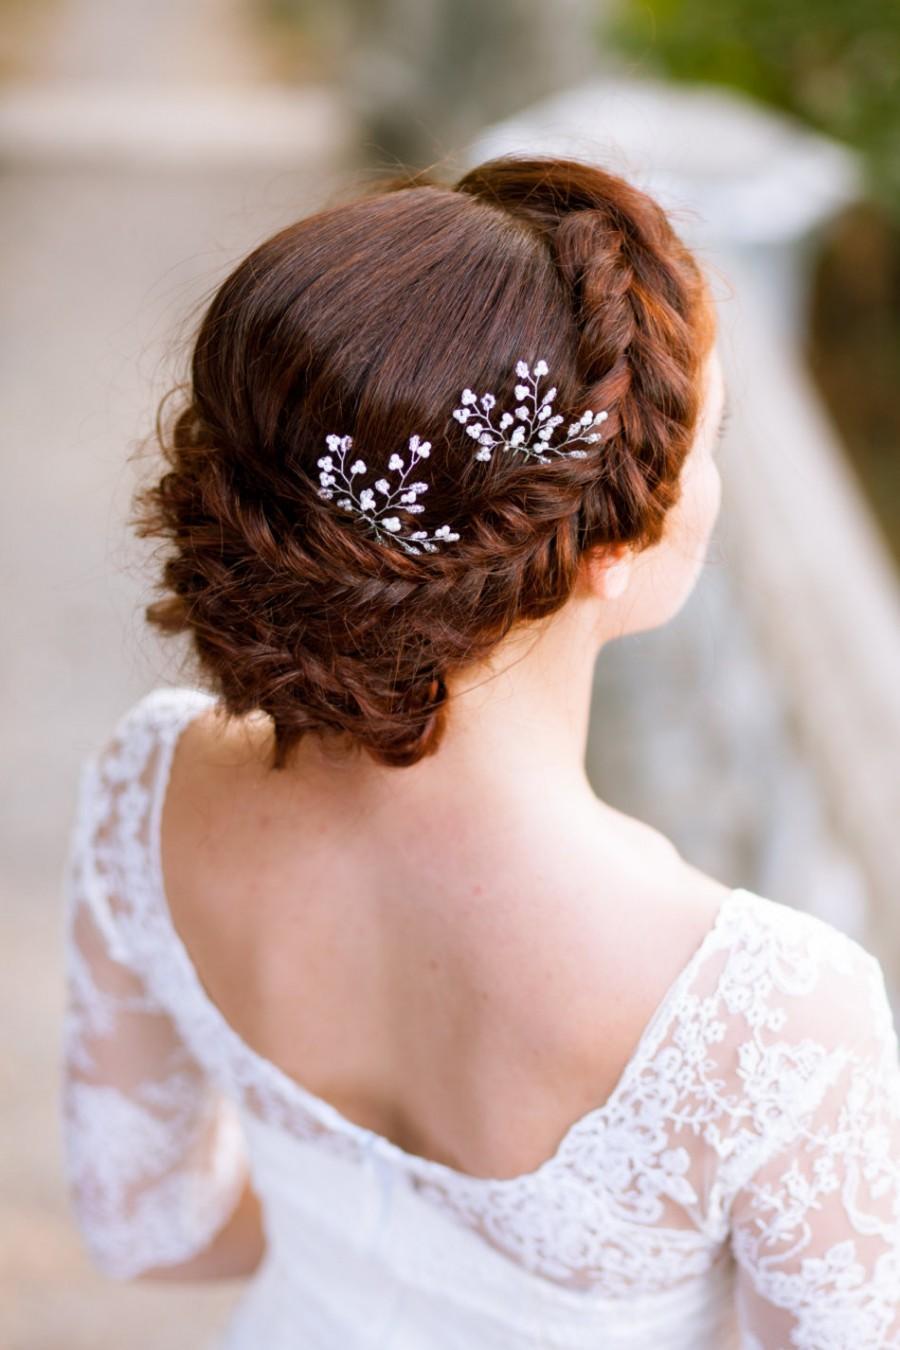 Bridal hair accessories babys breath - Bridal Pearl Hair Pins Babys Breath Hair Pins Wedding Pearl Hair Pins Bridal Headpiece Silver Bridal Hair Pins Set Of Two Bridal Hair Pins